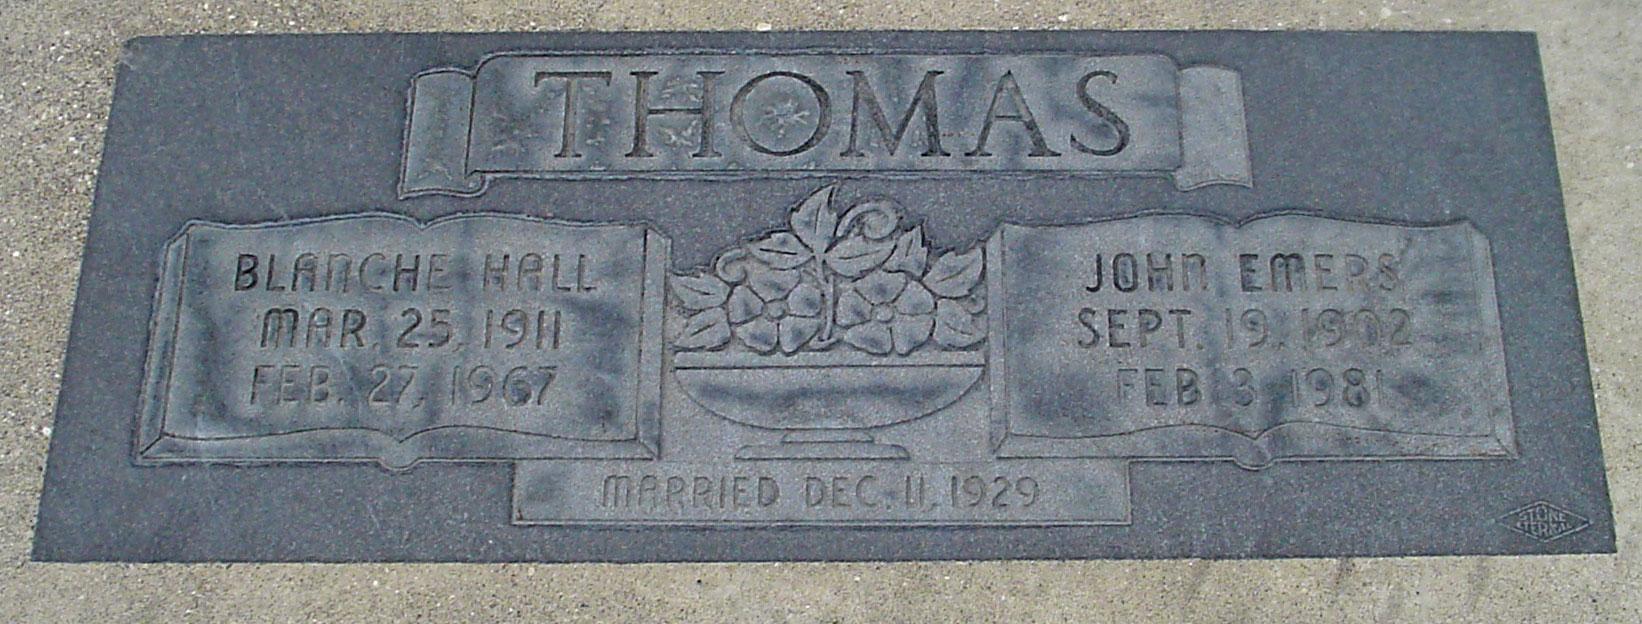 John Emers Jack Thomas